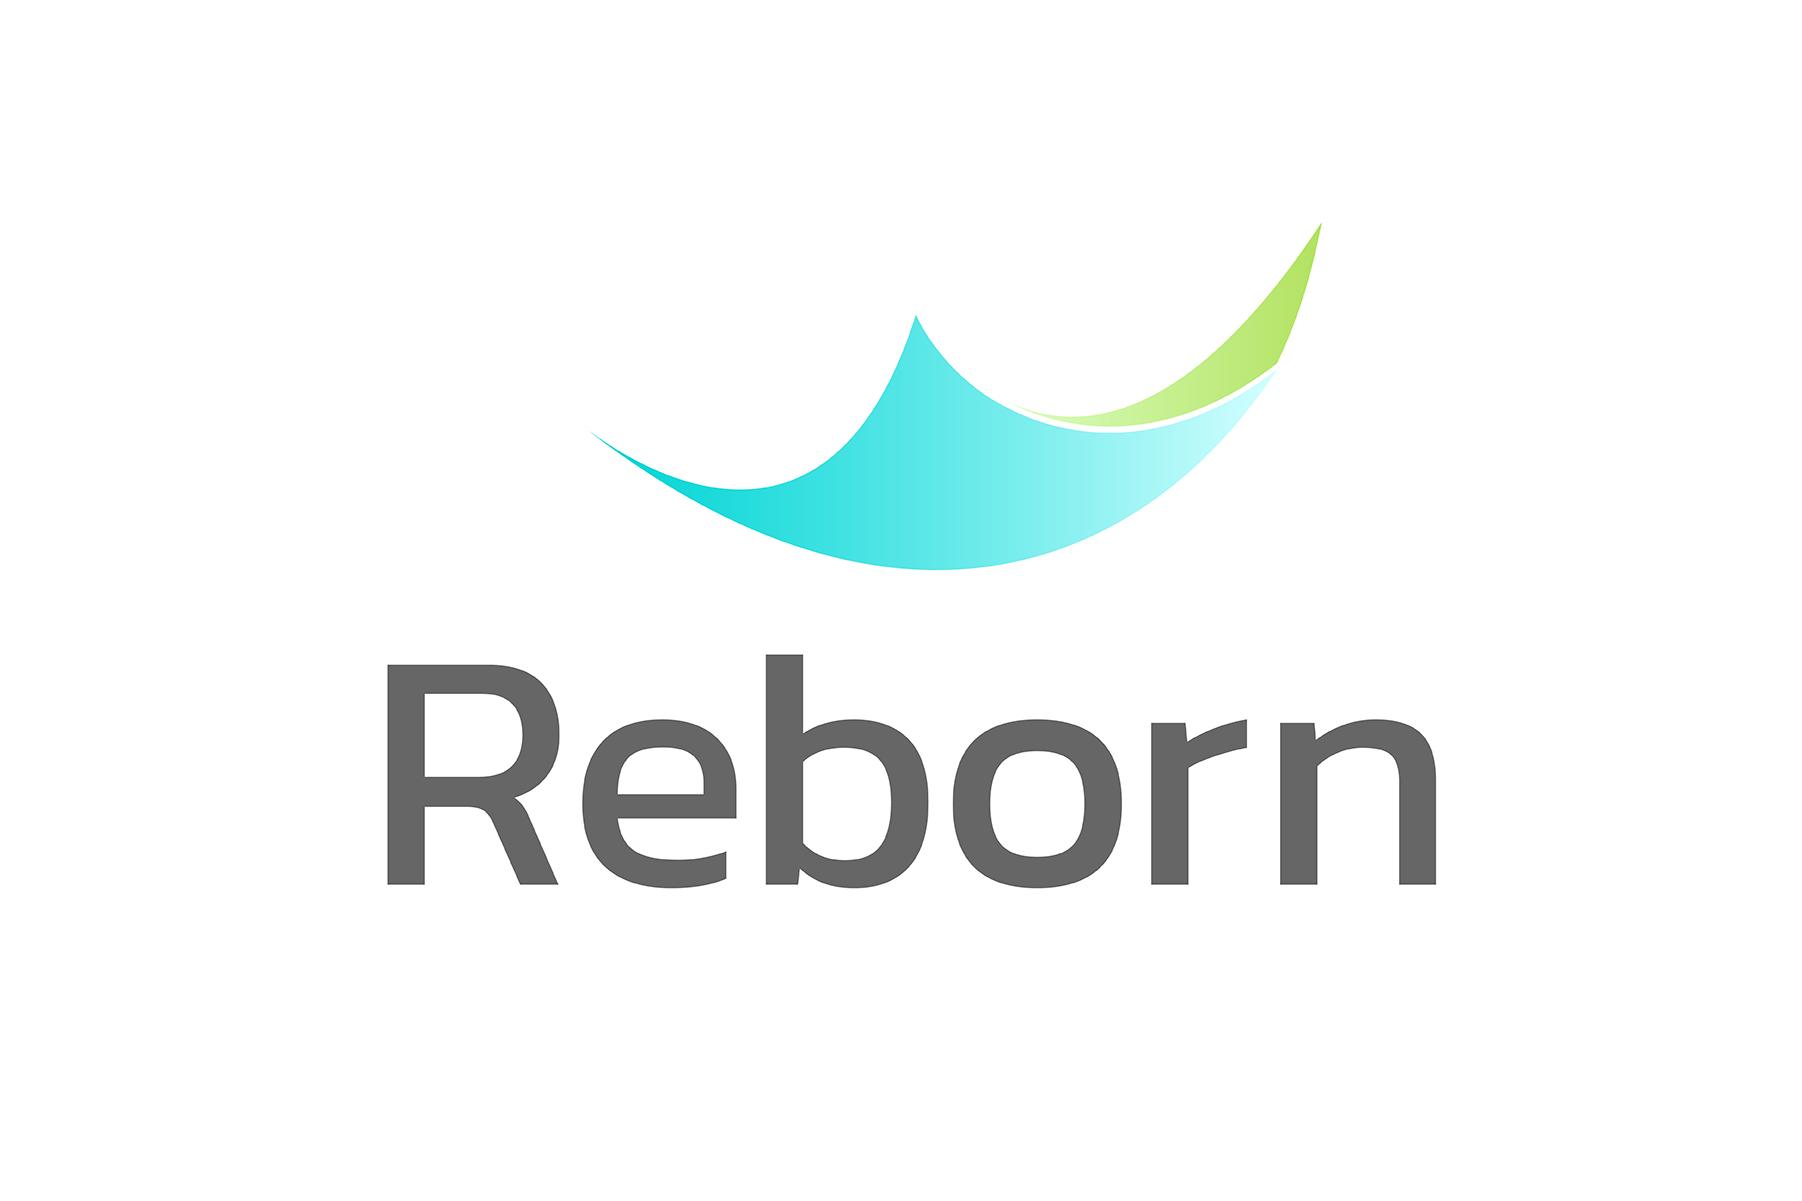 Reborn_Logo-Design_1.jpg